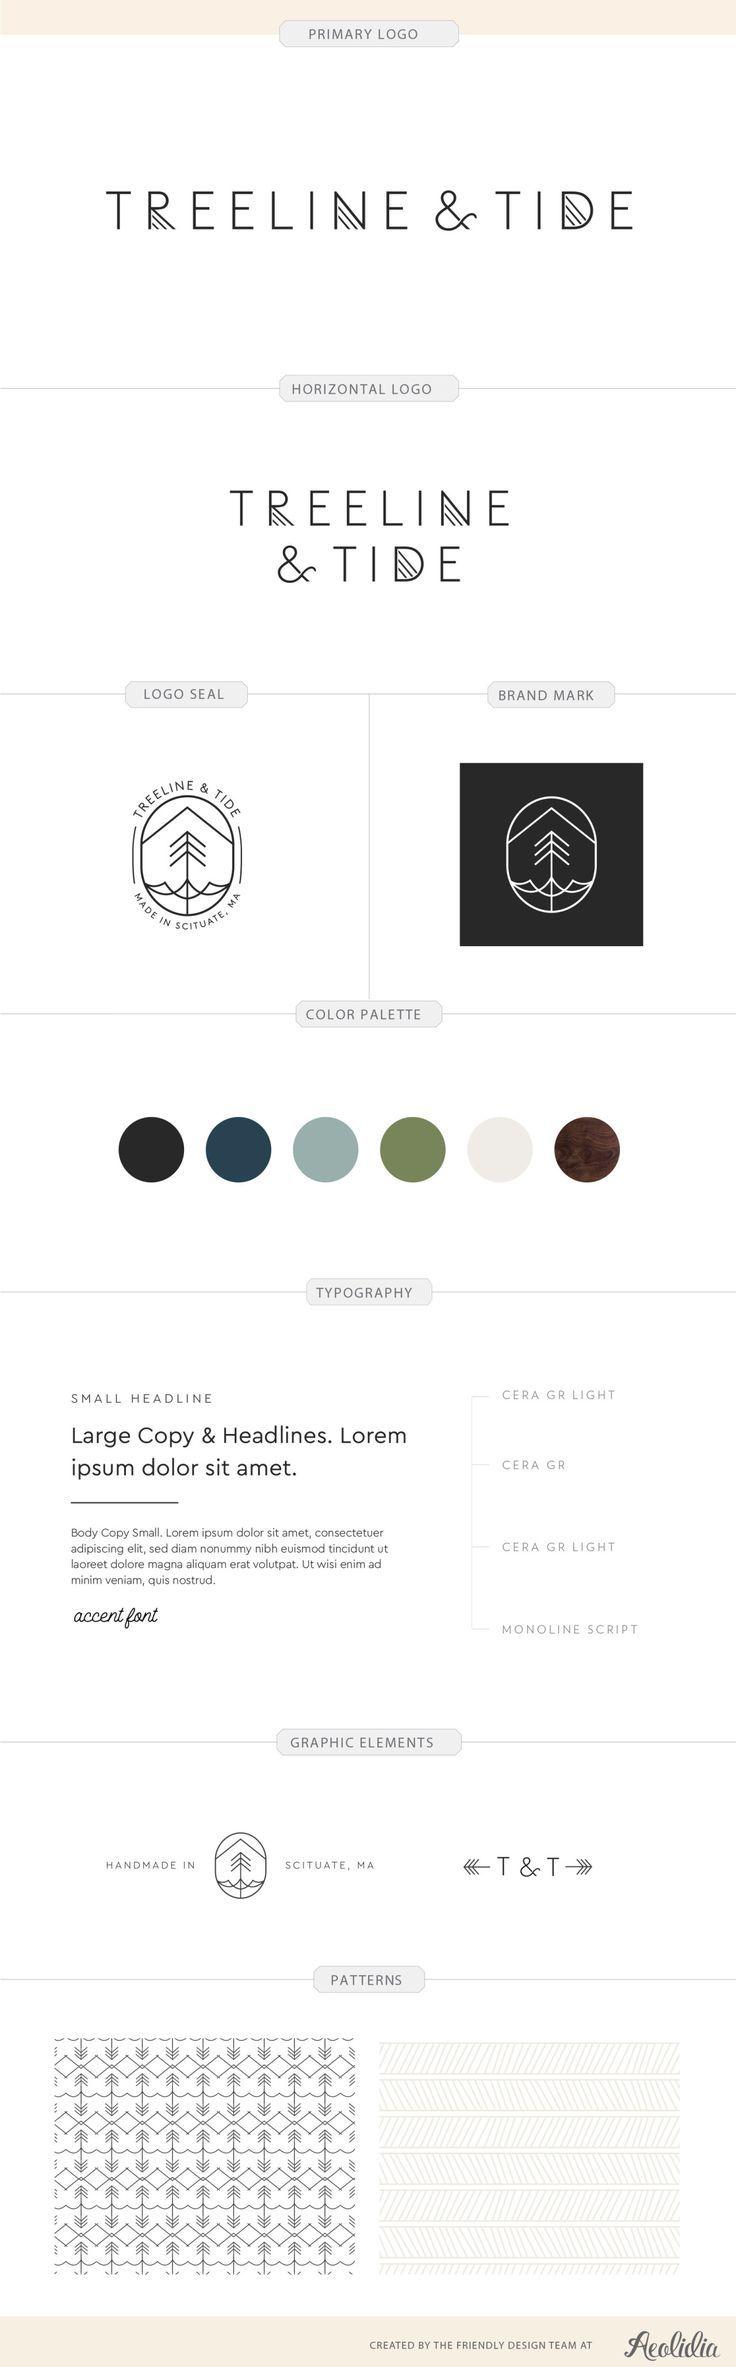 Treeline & Tide Brand identity, Branding design, Brand